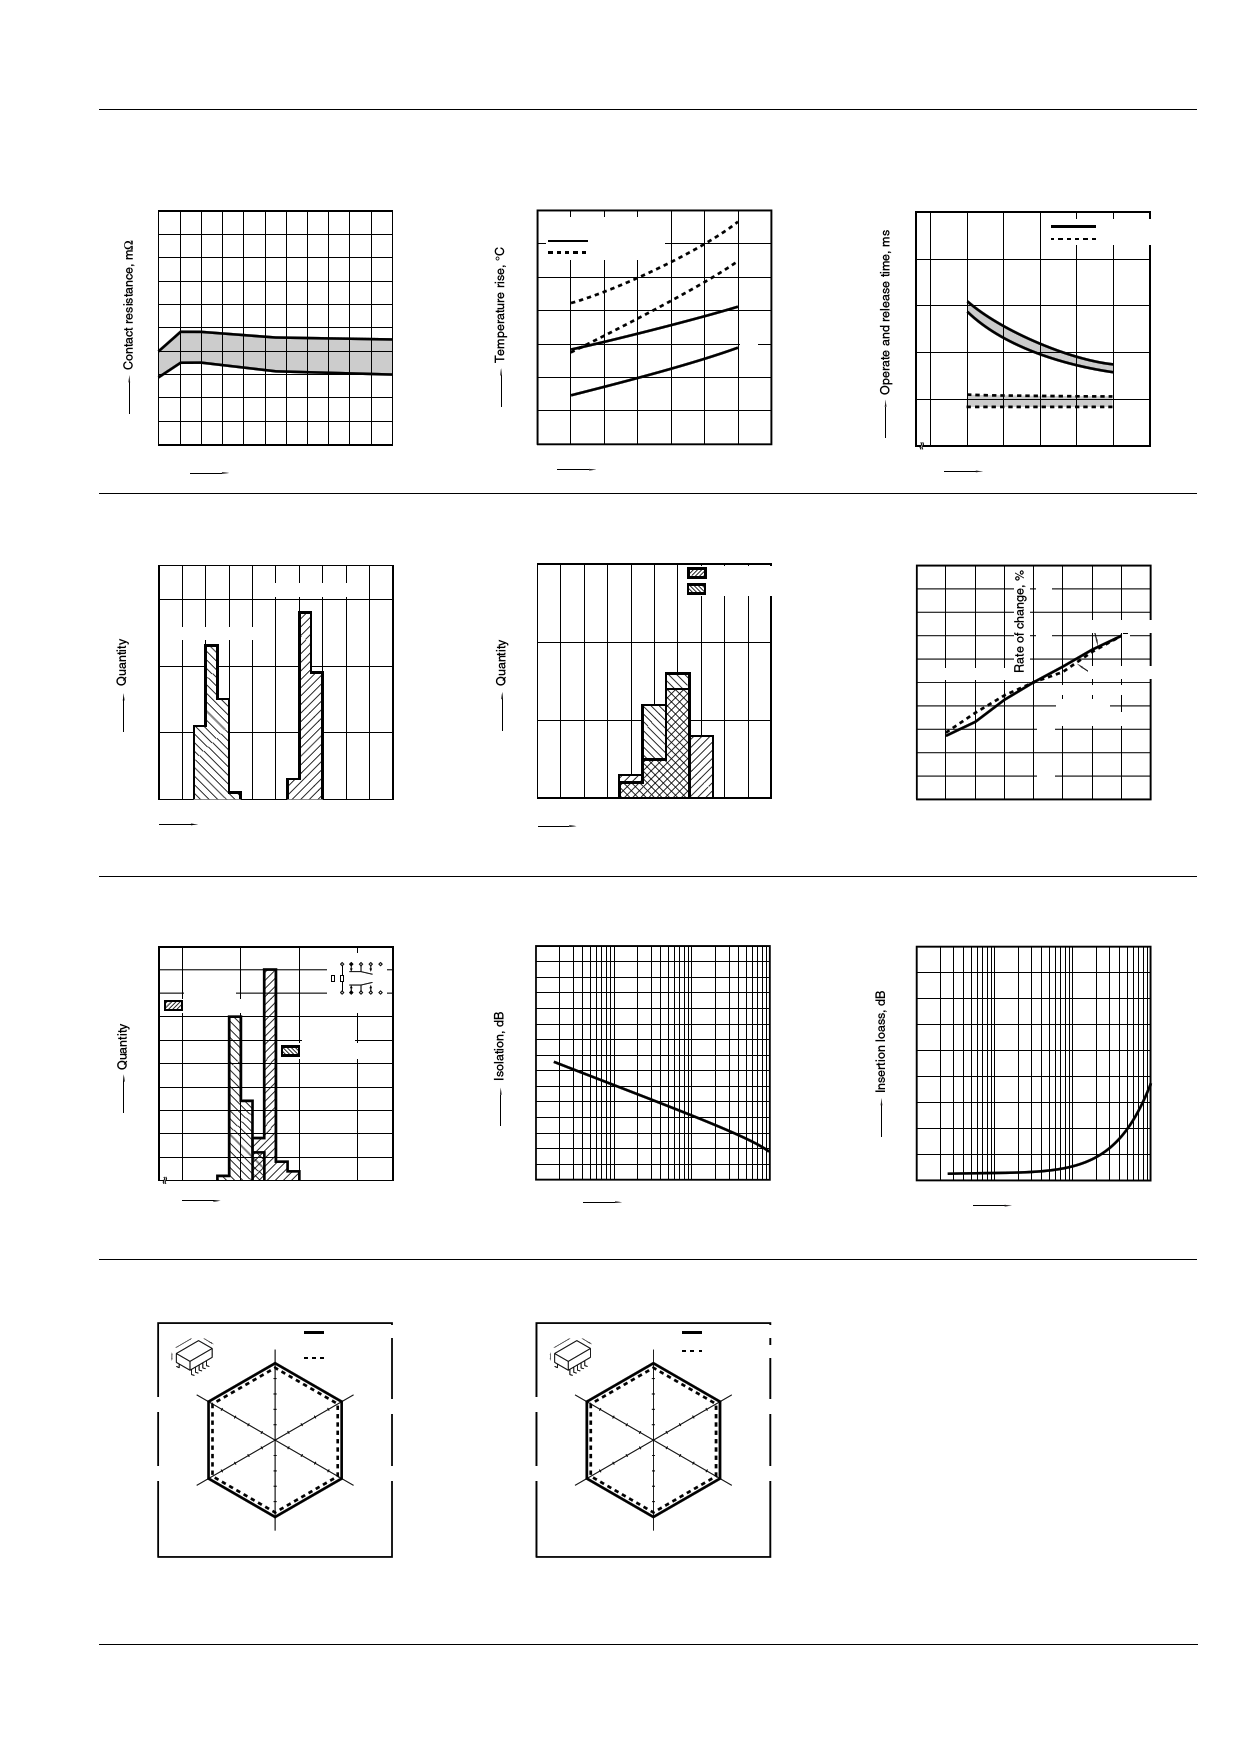 TQ2SL-L2-4.5V pdf, 반도체, 판매, 대치품